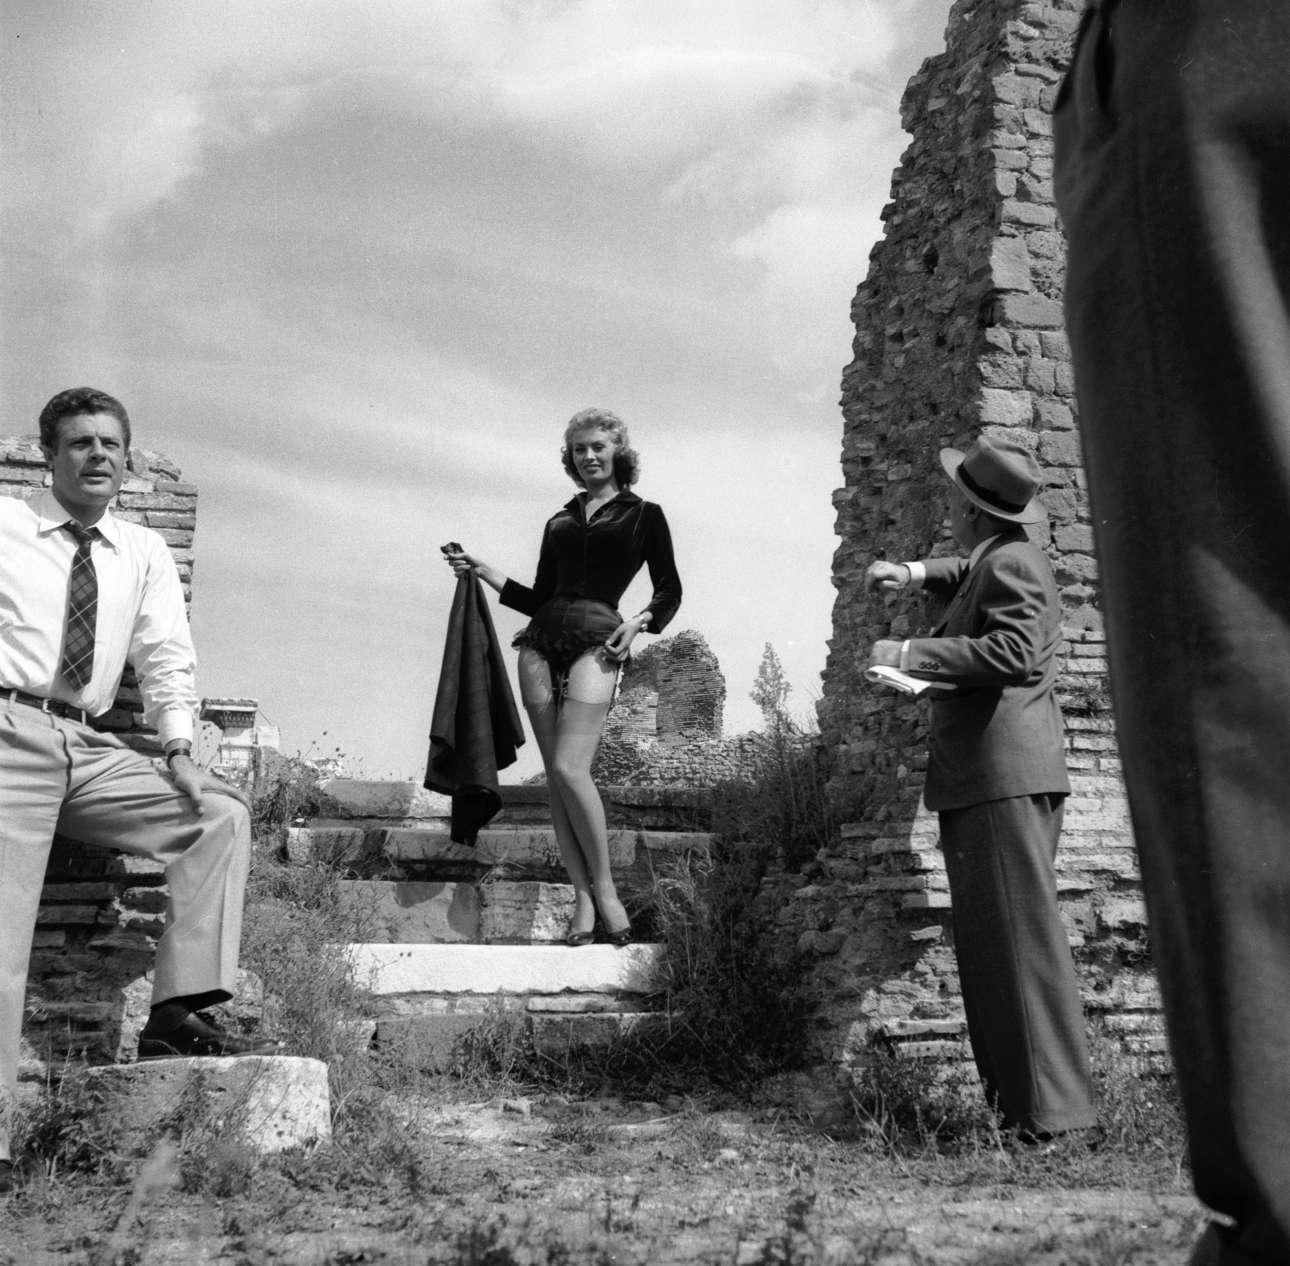 H Λόρεν σε ένα ιδιότυπο στριπτίζ εν μέσω αρχαιοτήτων στα γυρίσματα του φιλμ «La fortuna di essere donna» (1956), φιλμ που στην Ελλάδα παίχτηκε με τον τίτλο «Ευτυχώς που είμαι γυναίκα». Ευτυχώς που ήσουν η Λόρεν, να προσθέσουμε εμείς